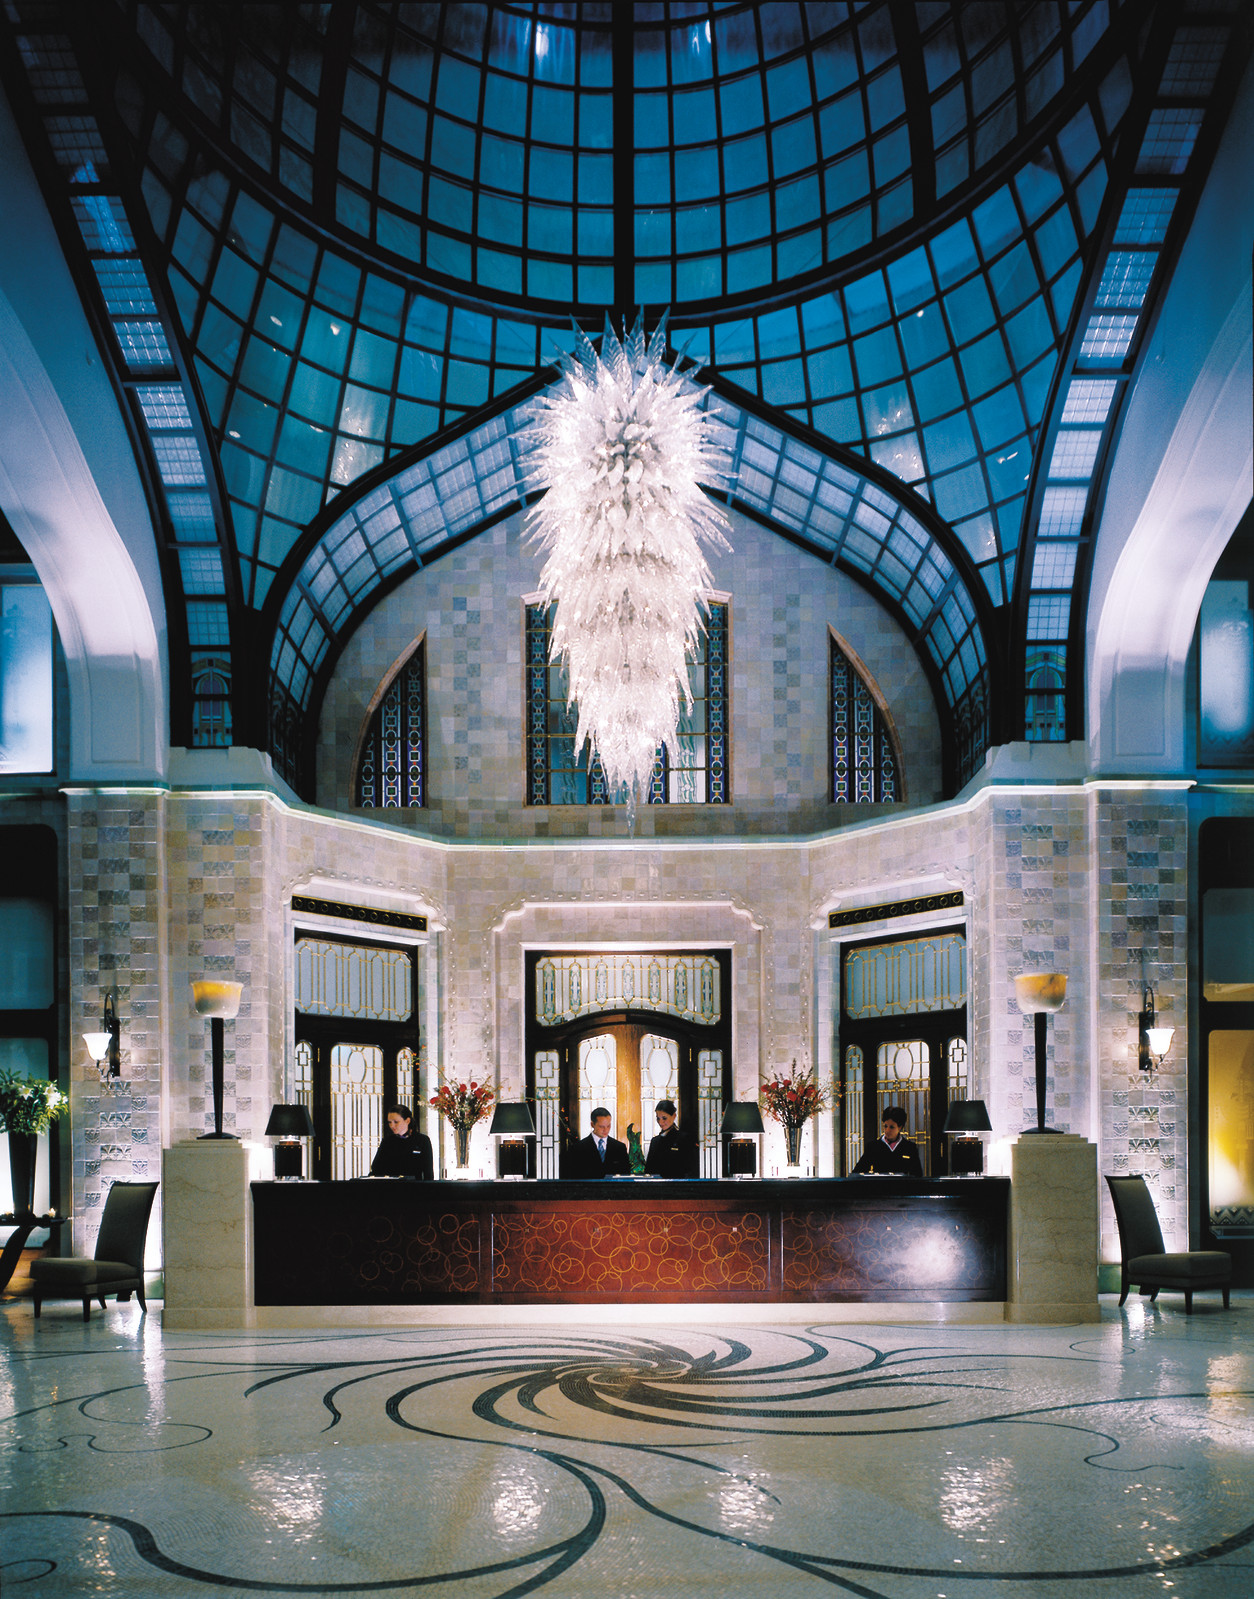 Amazing-interior-design-Hotel-Four-Seasons-Gresham-Palace-Budapest-lobby-with-beautiful-flooring-lighting-and-furnishing